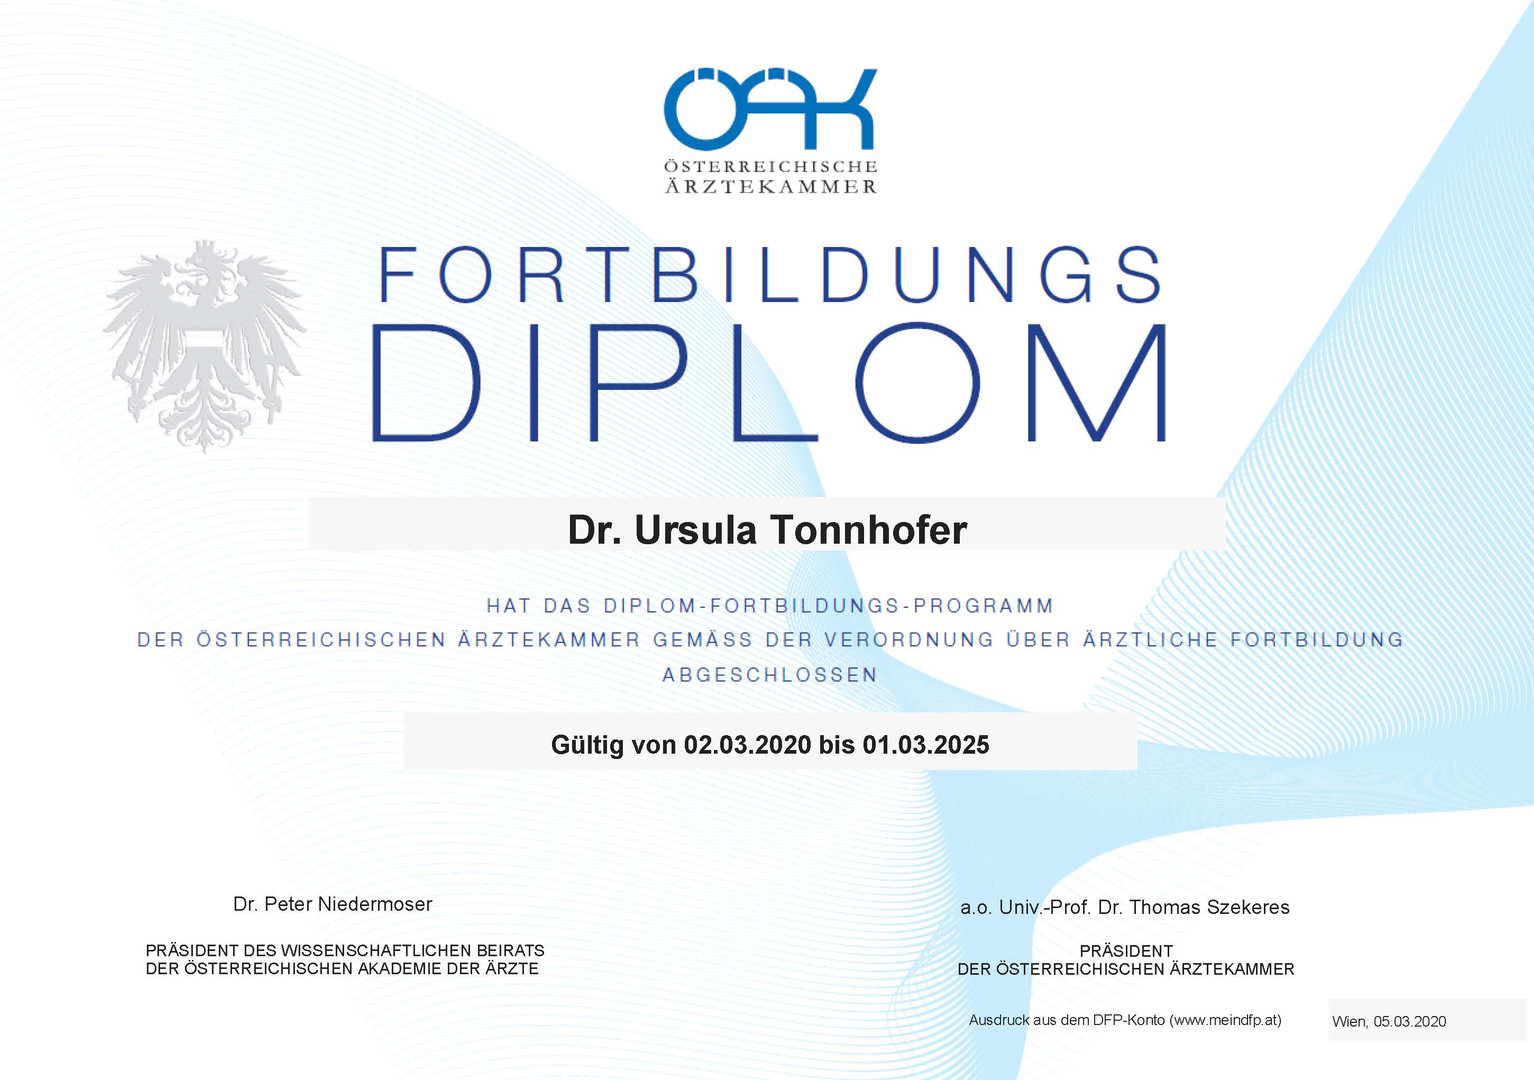 DFP Diplom 2020.jpg